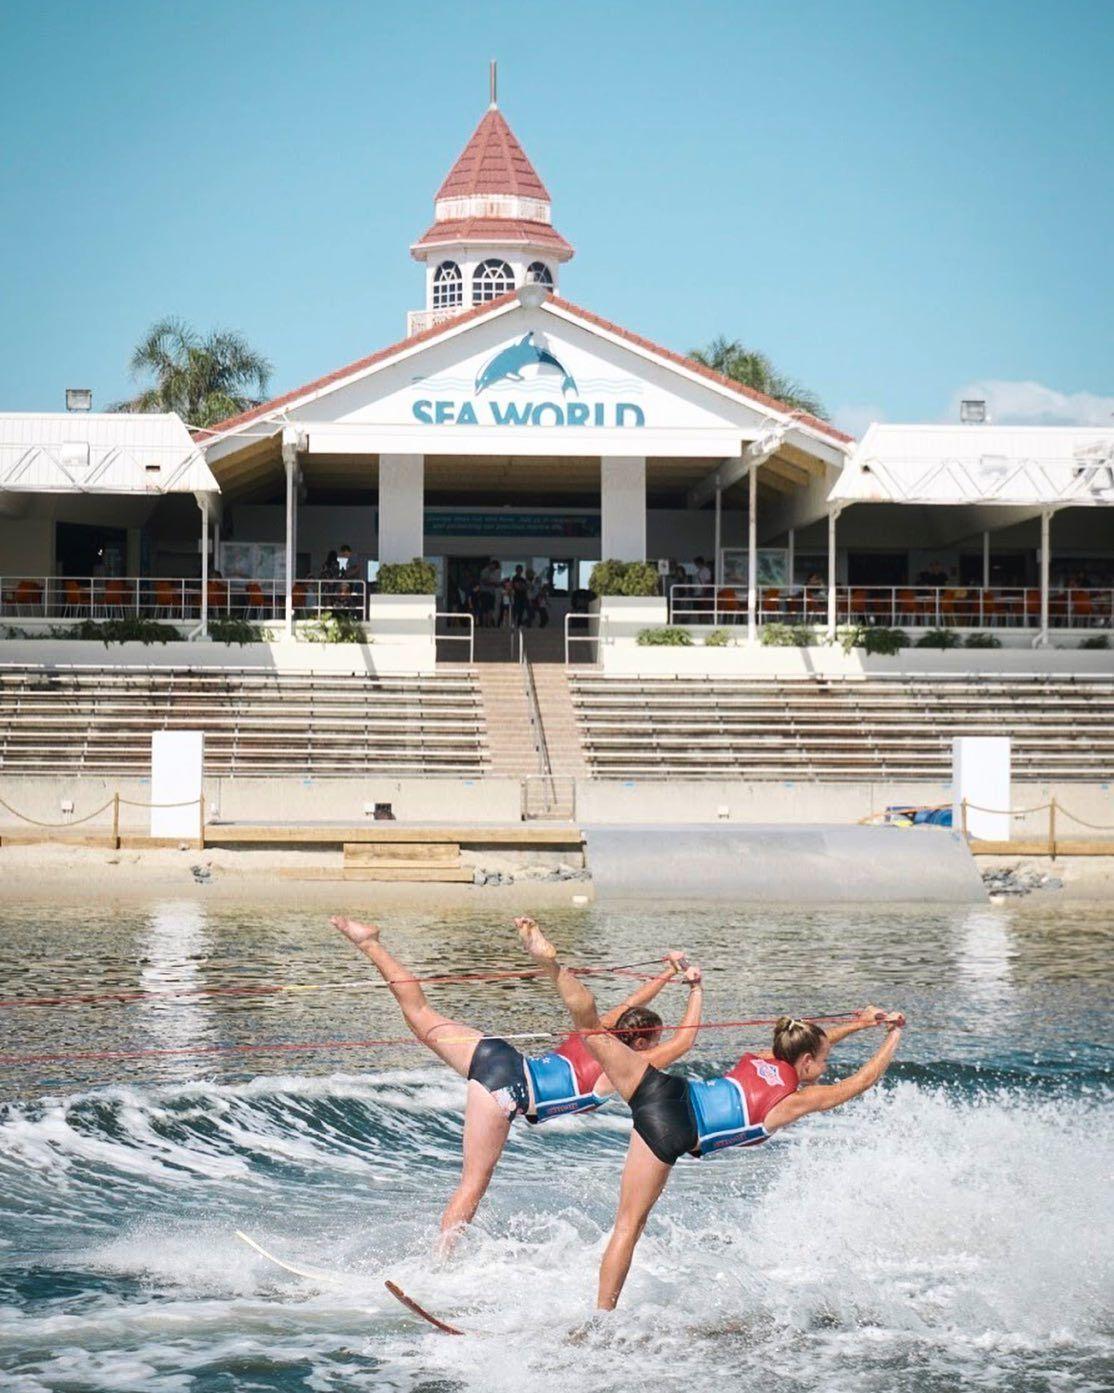 Sea World Marine Park Gold Coast Australia Sea World Australia Travel Australia